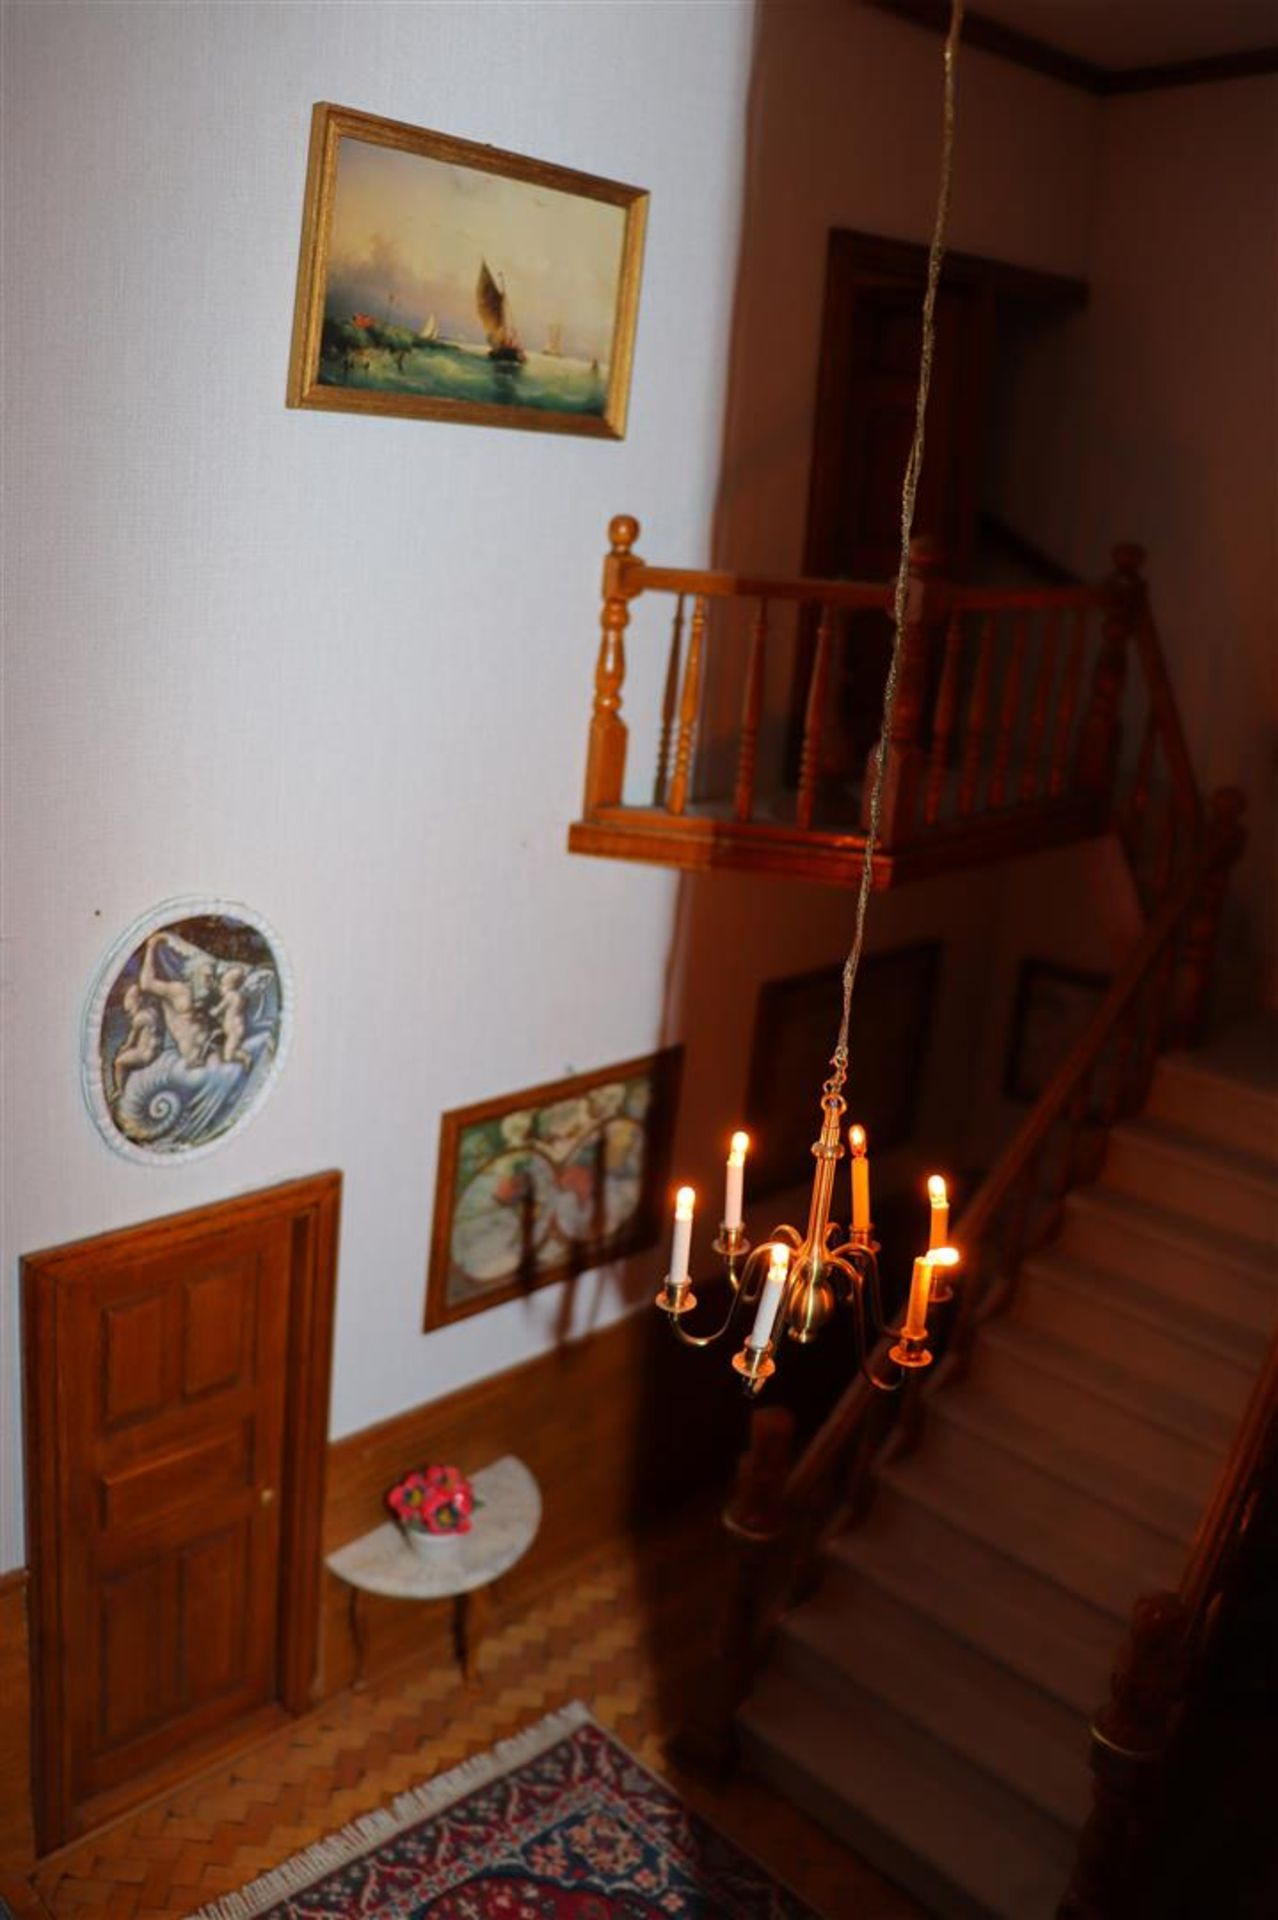 Dollhouse De Kettenborgh by Mrs. J C Wirix Kettenborg - Image 70 of 106